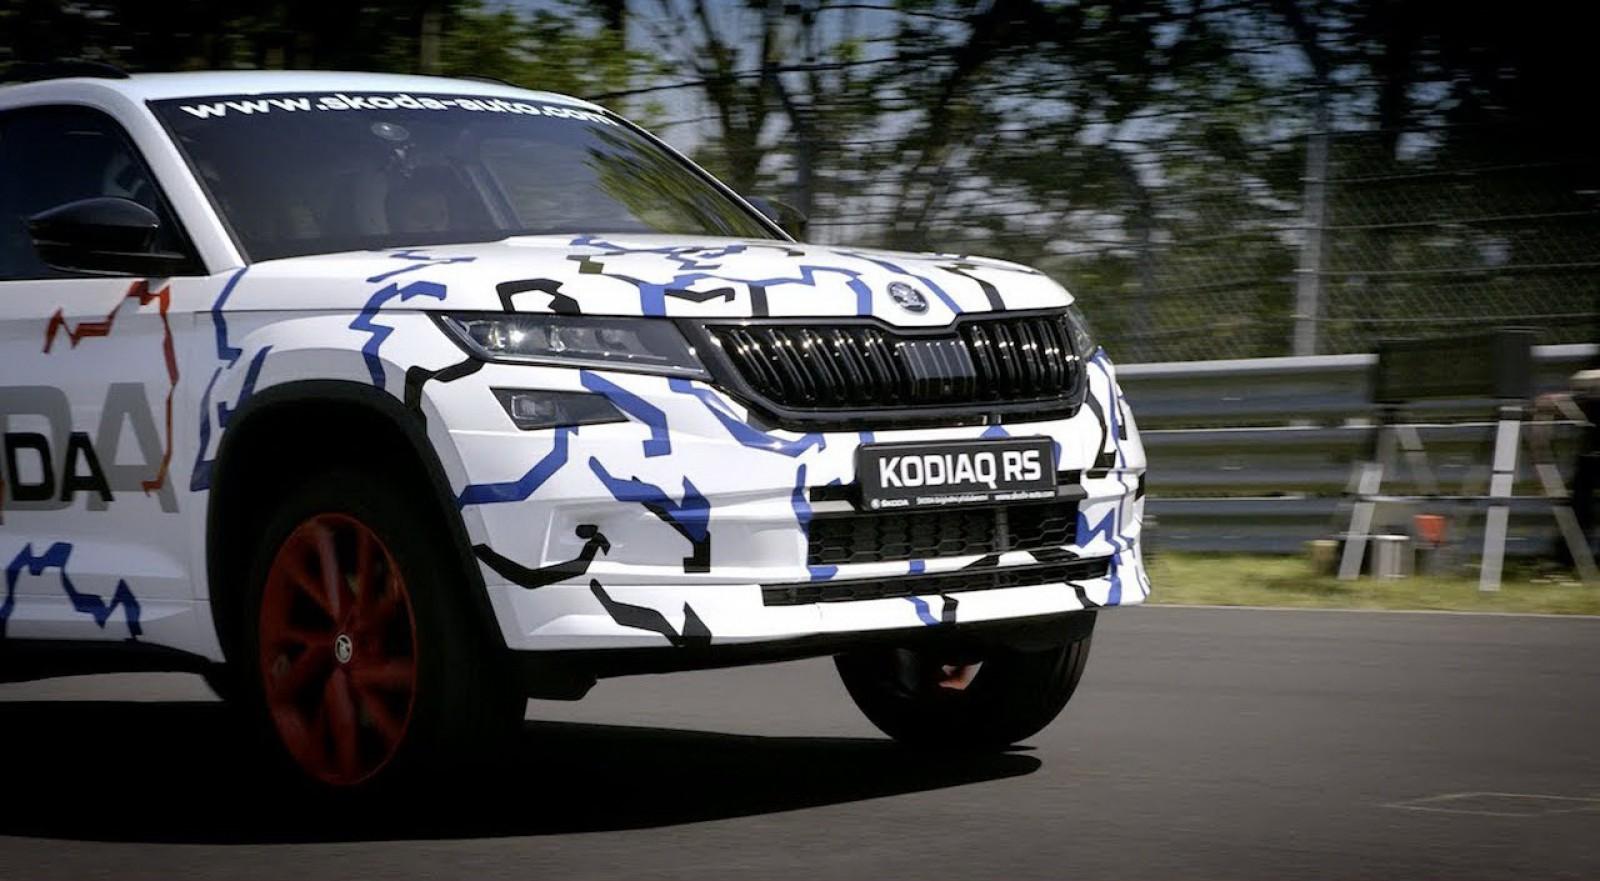 (video) Noul Skoda Kodiaq RS a stabilit un record de timp pe Nurburgring? Vom afla la 14 iunie